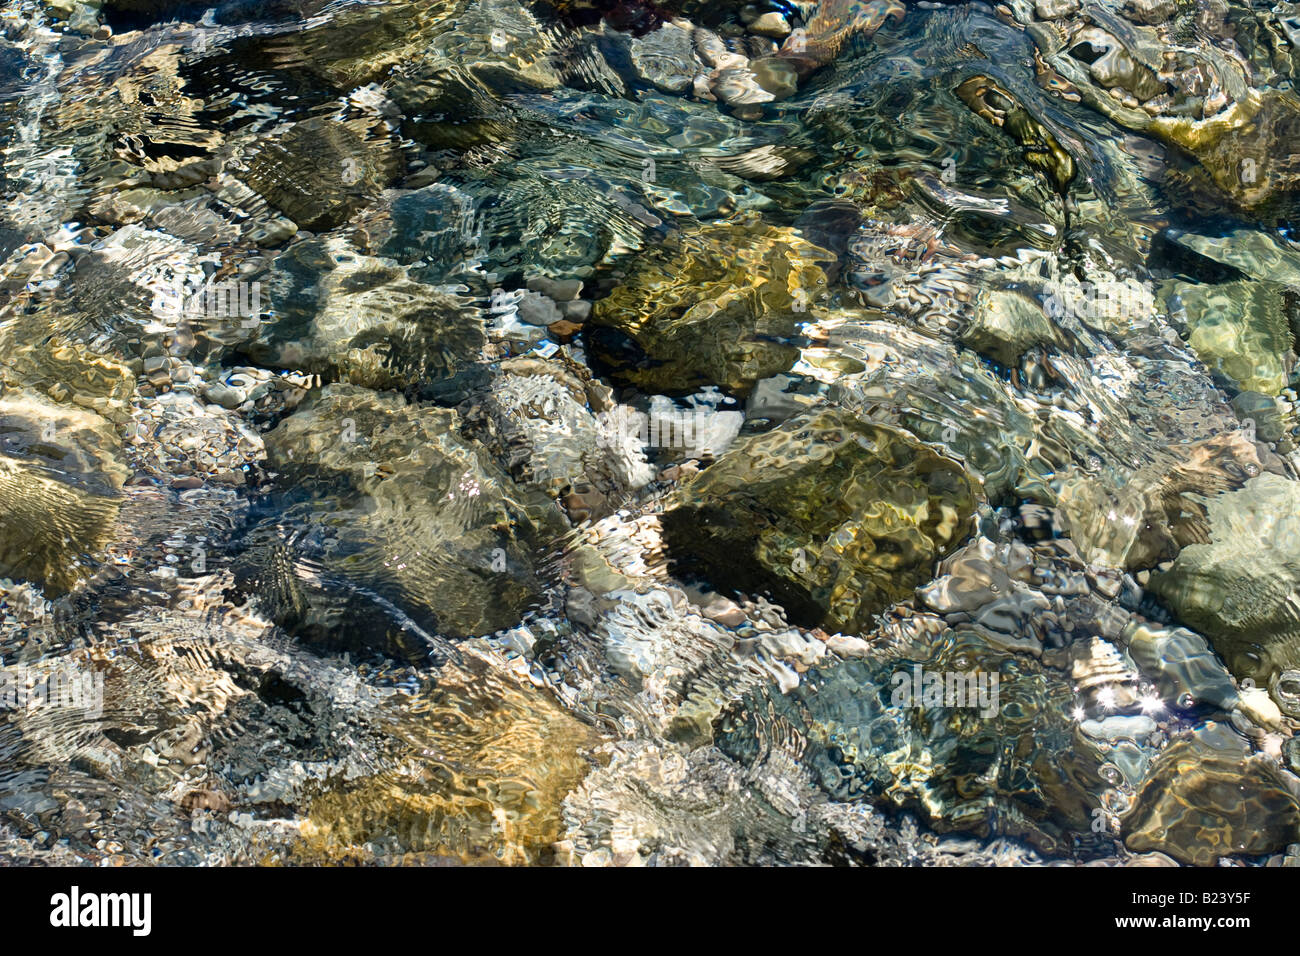 Stony sea floor viewed through gentle waves - Stock Image